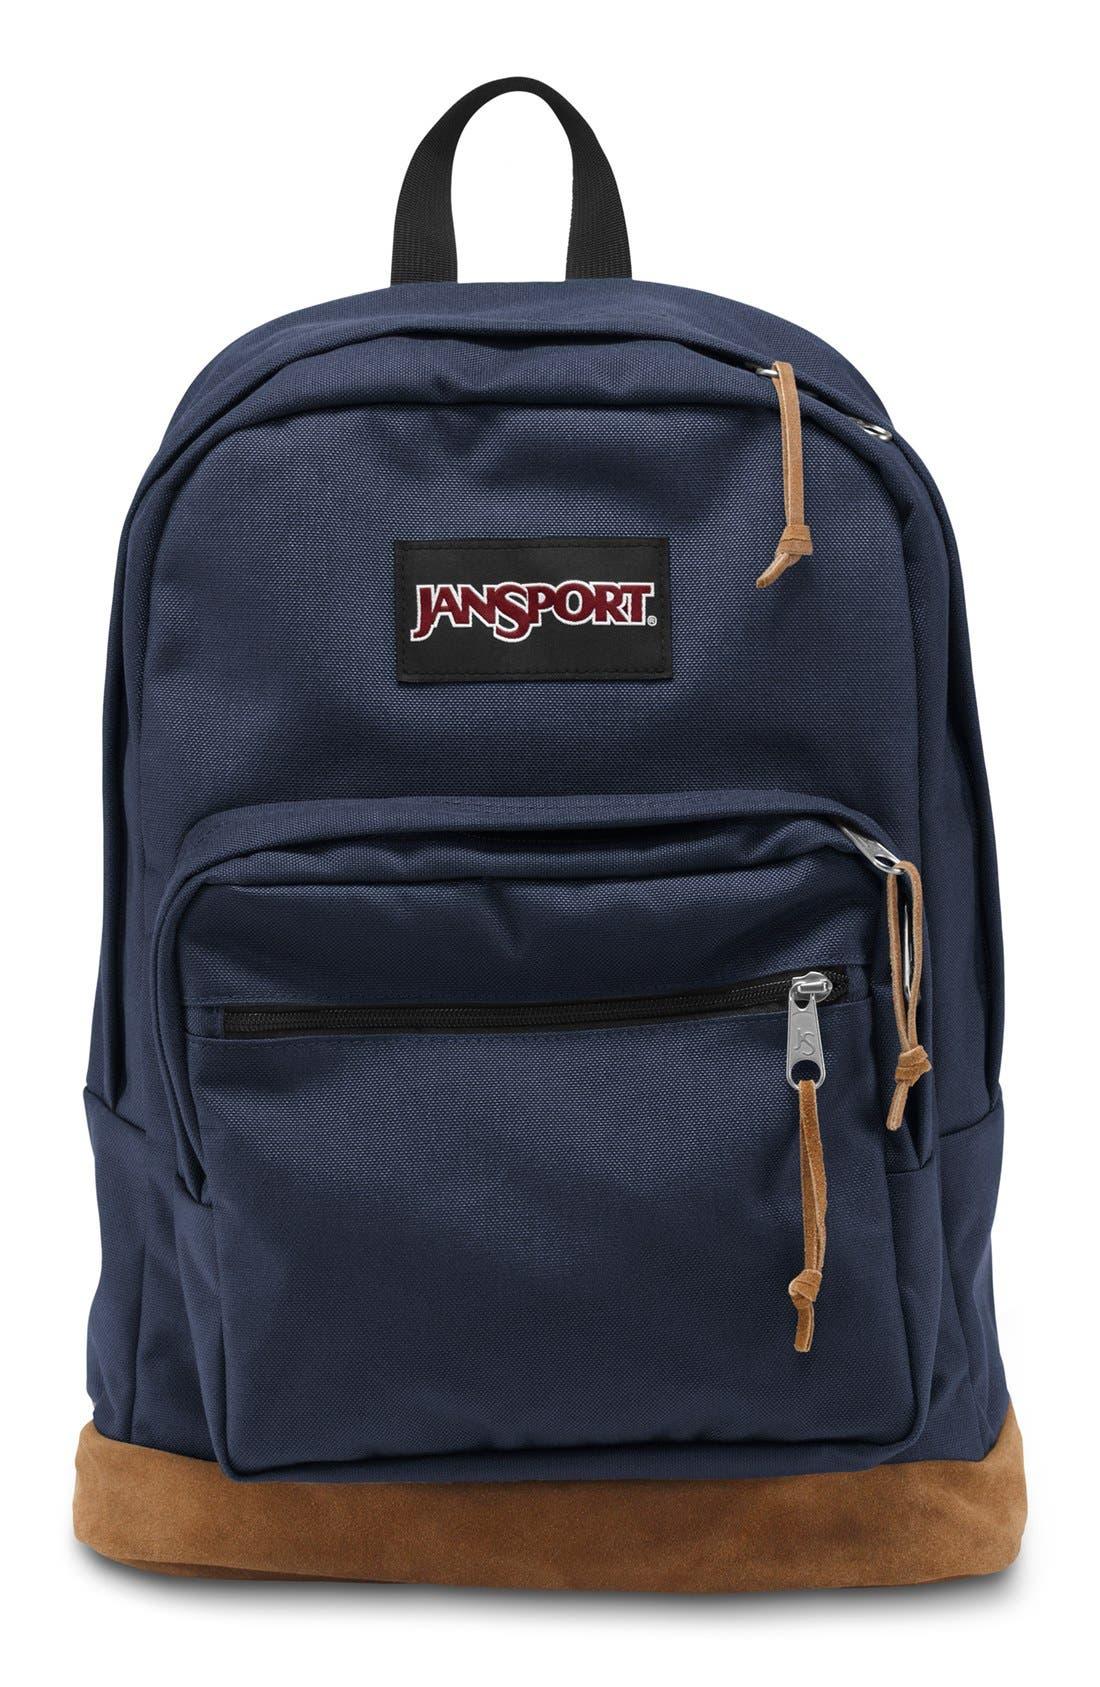 Alternate Image 1 Selected - Jansport 'Right Pack' Backpack